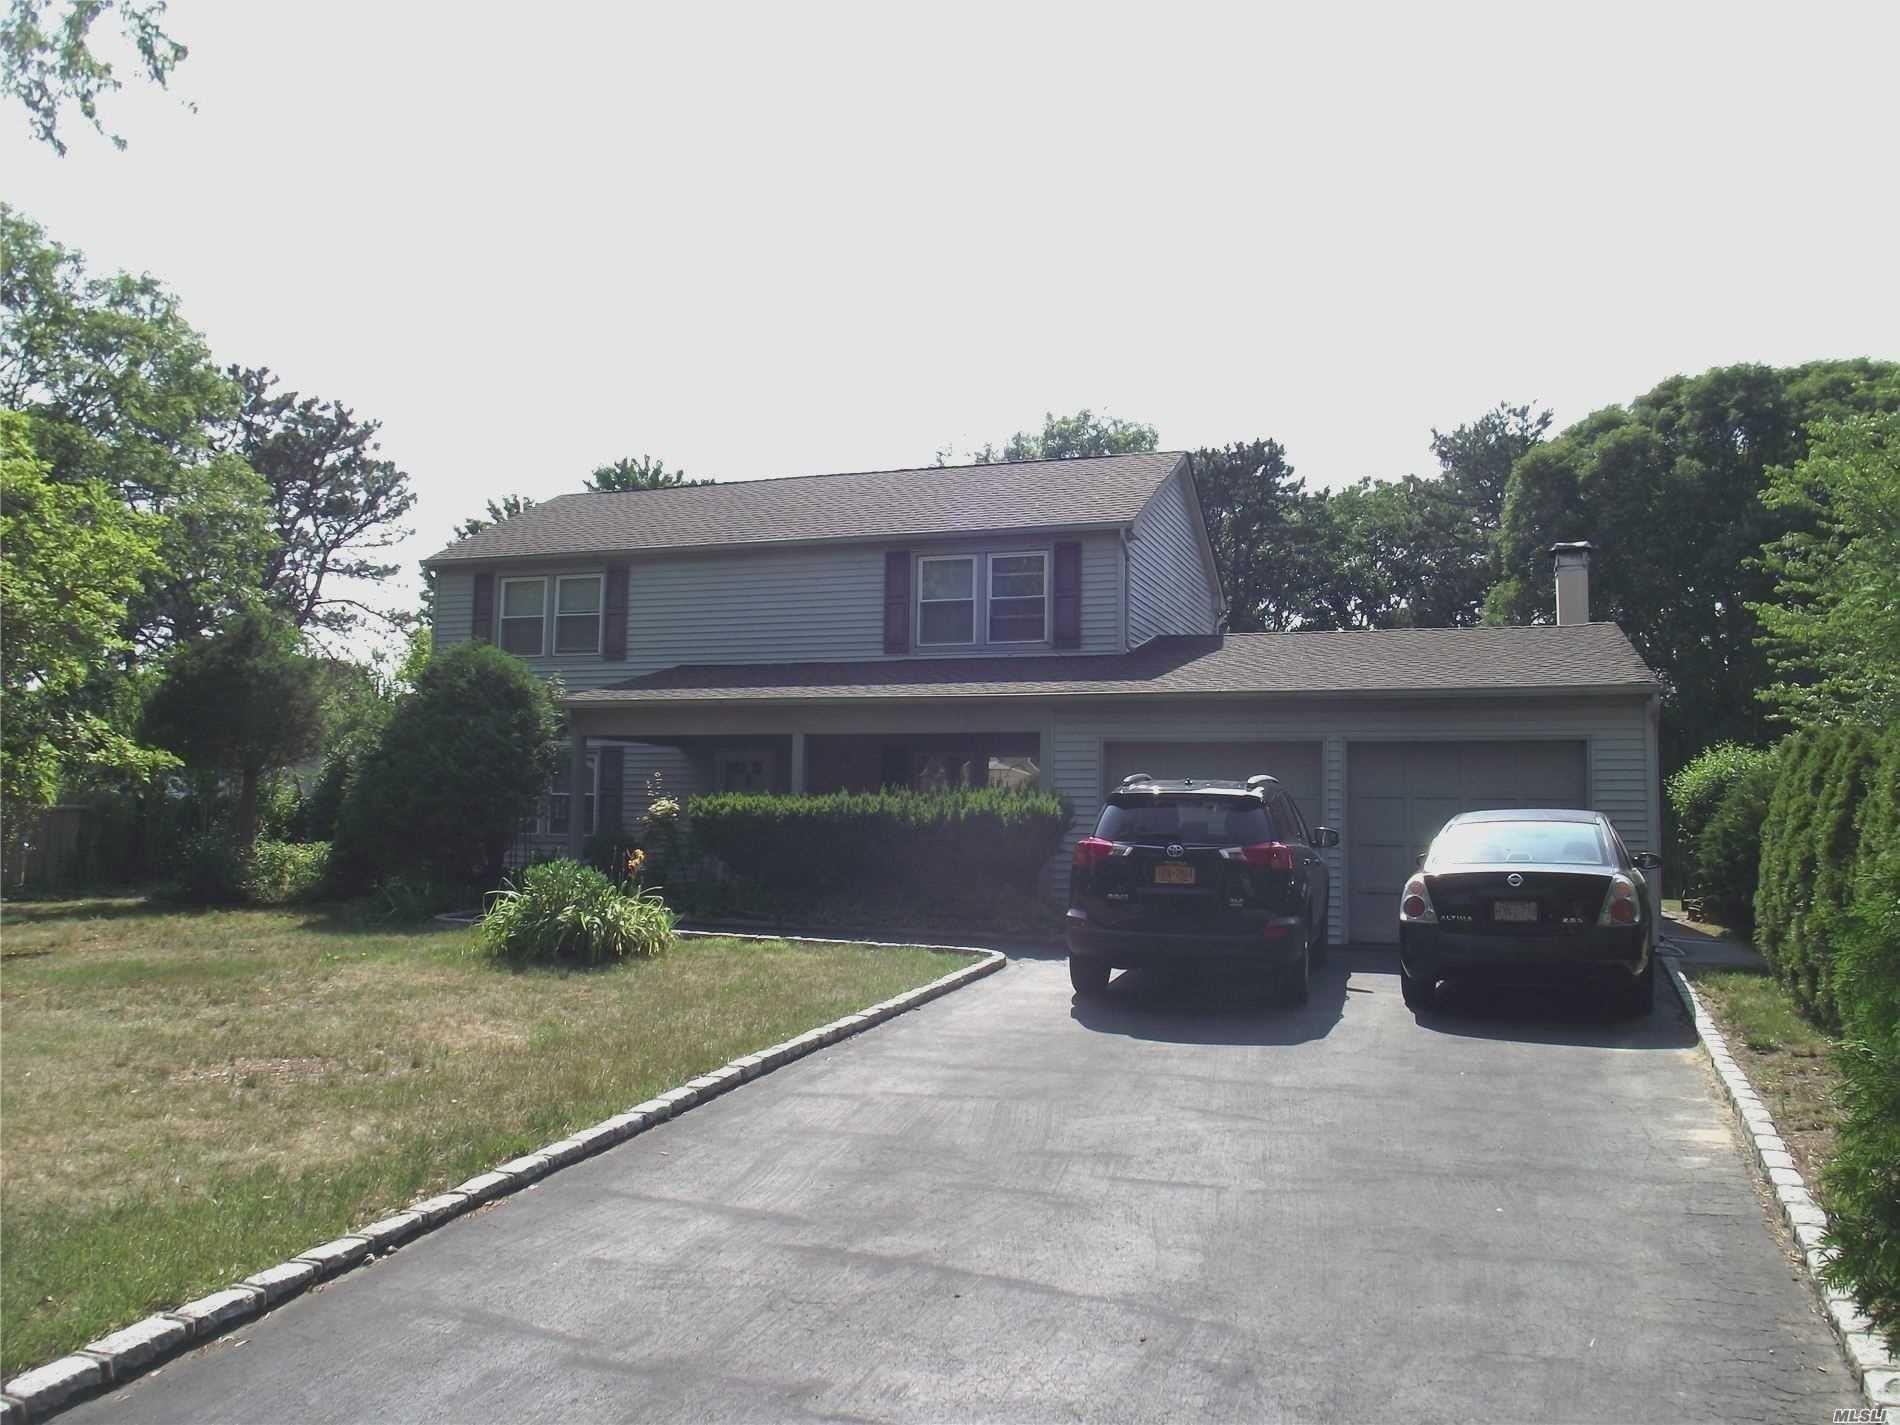 32 Winside Lane, Coram, NY 11727 - MLS#: 3202990